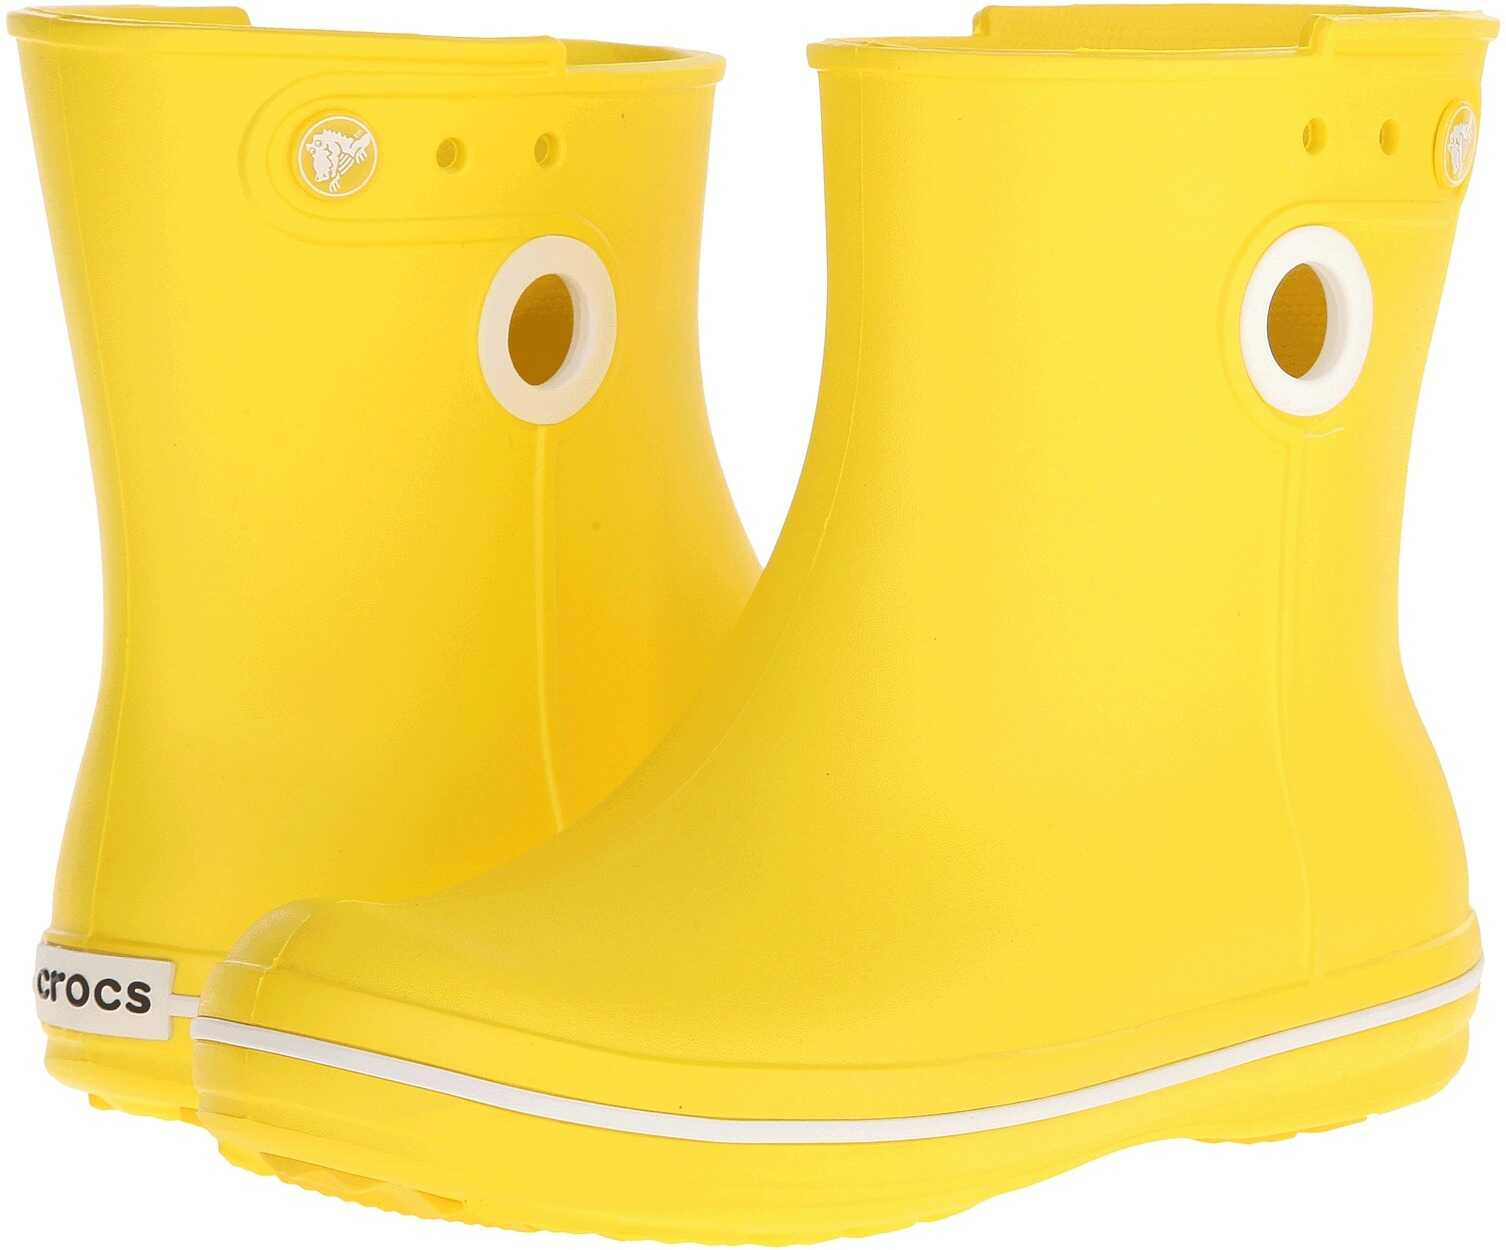 Crocs Jaunt Shorty Boot Lemon